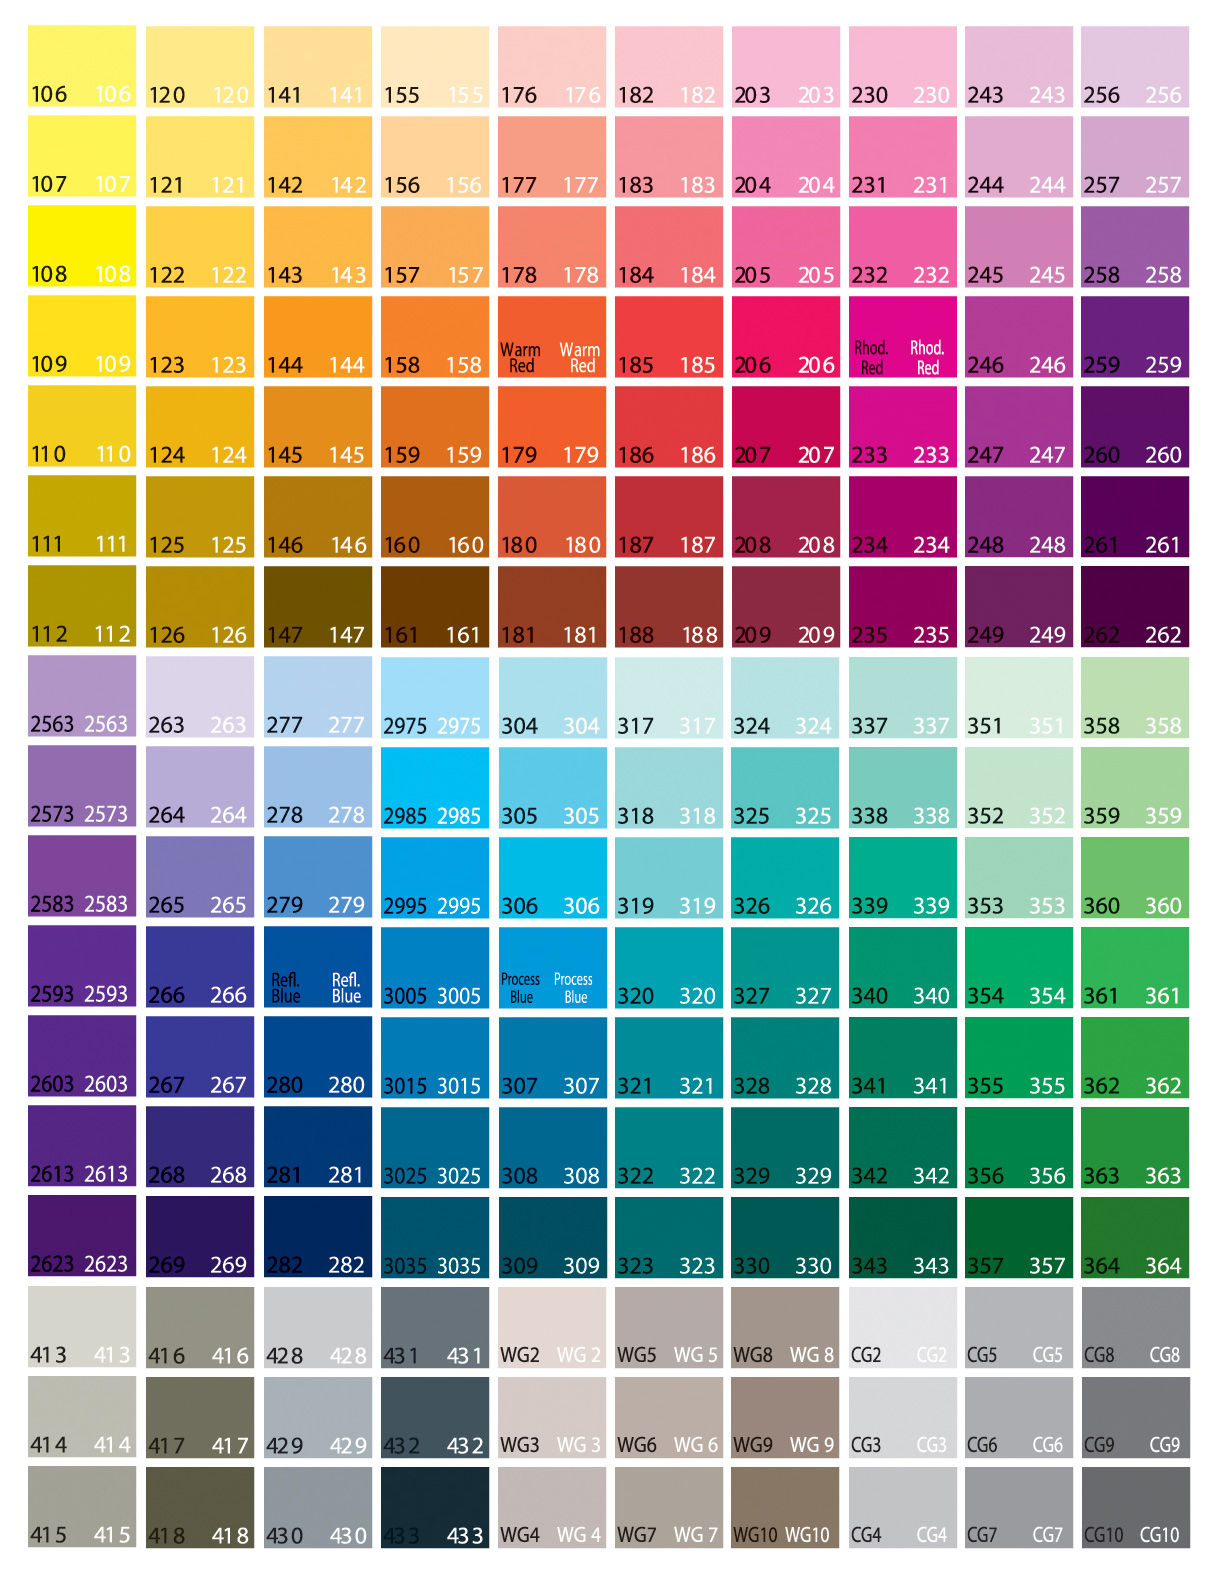 ocsp-color-chart.jpg